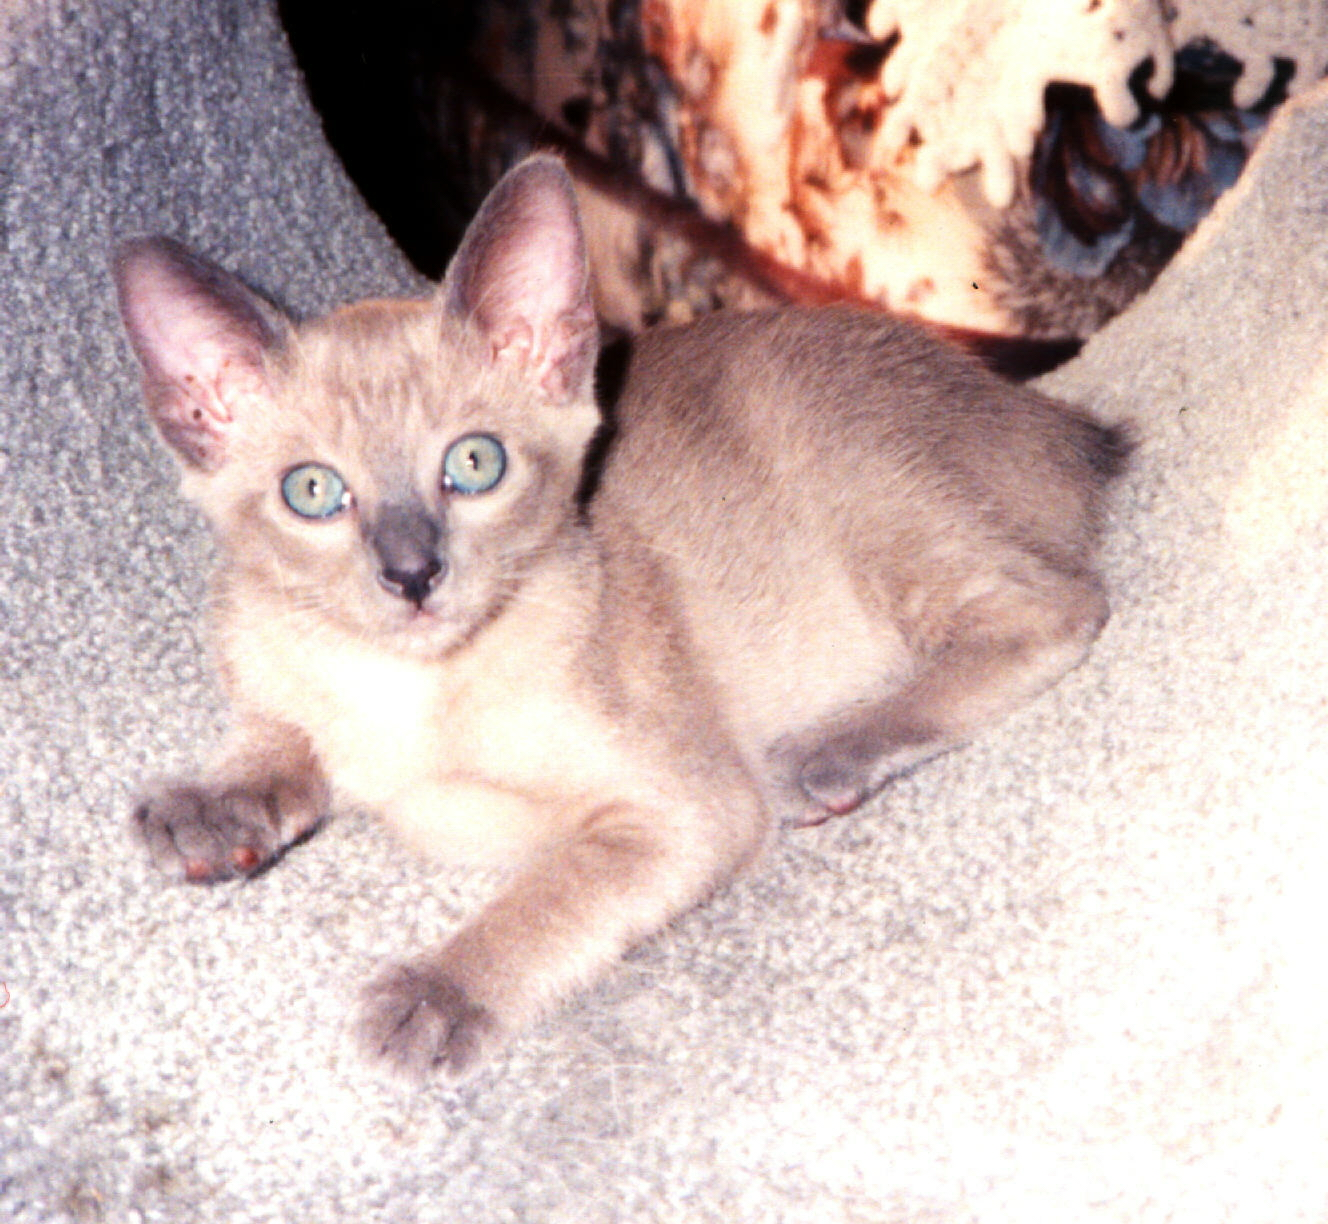 Suphalak Cat: Suphalak Faqttonkinese Breed